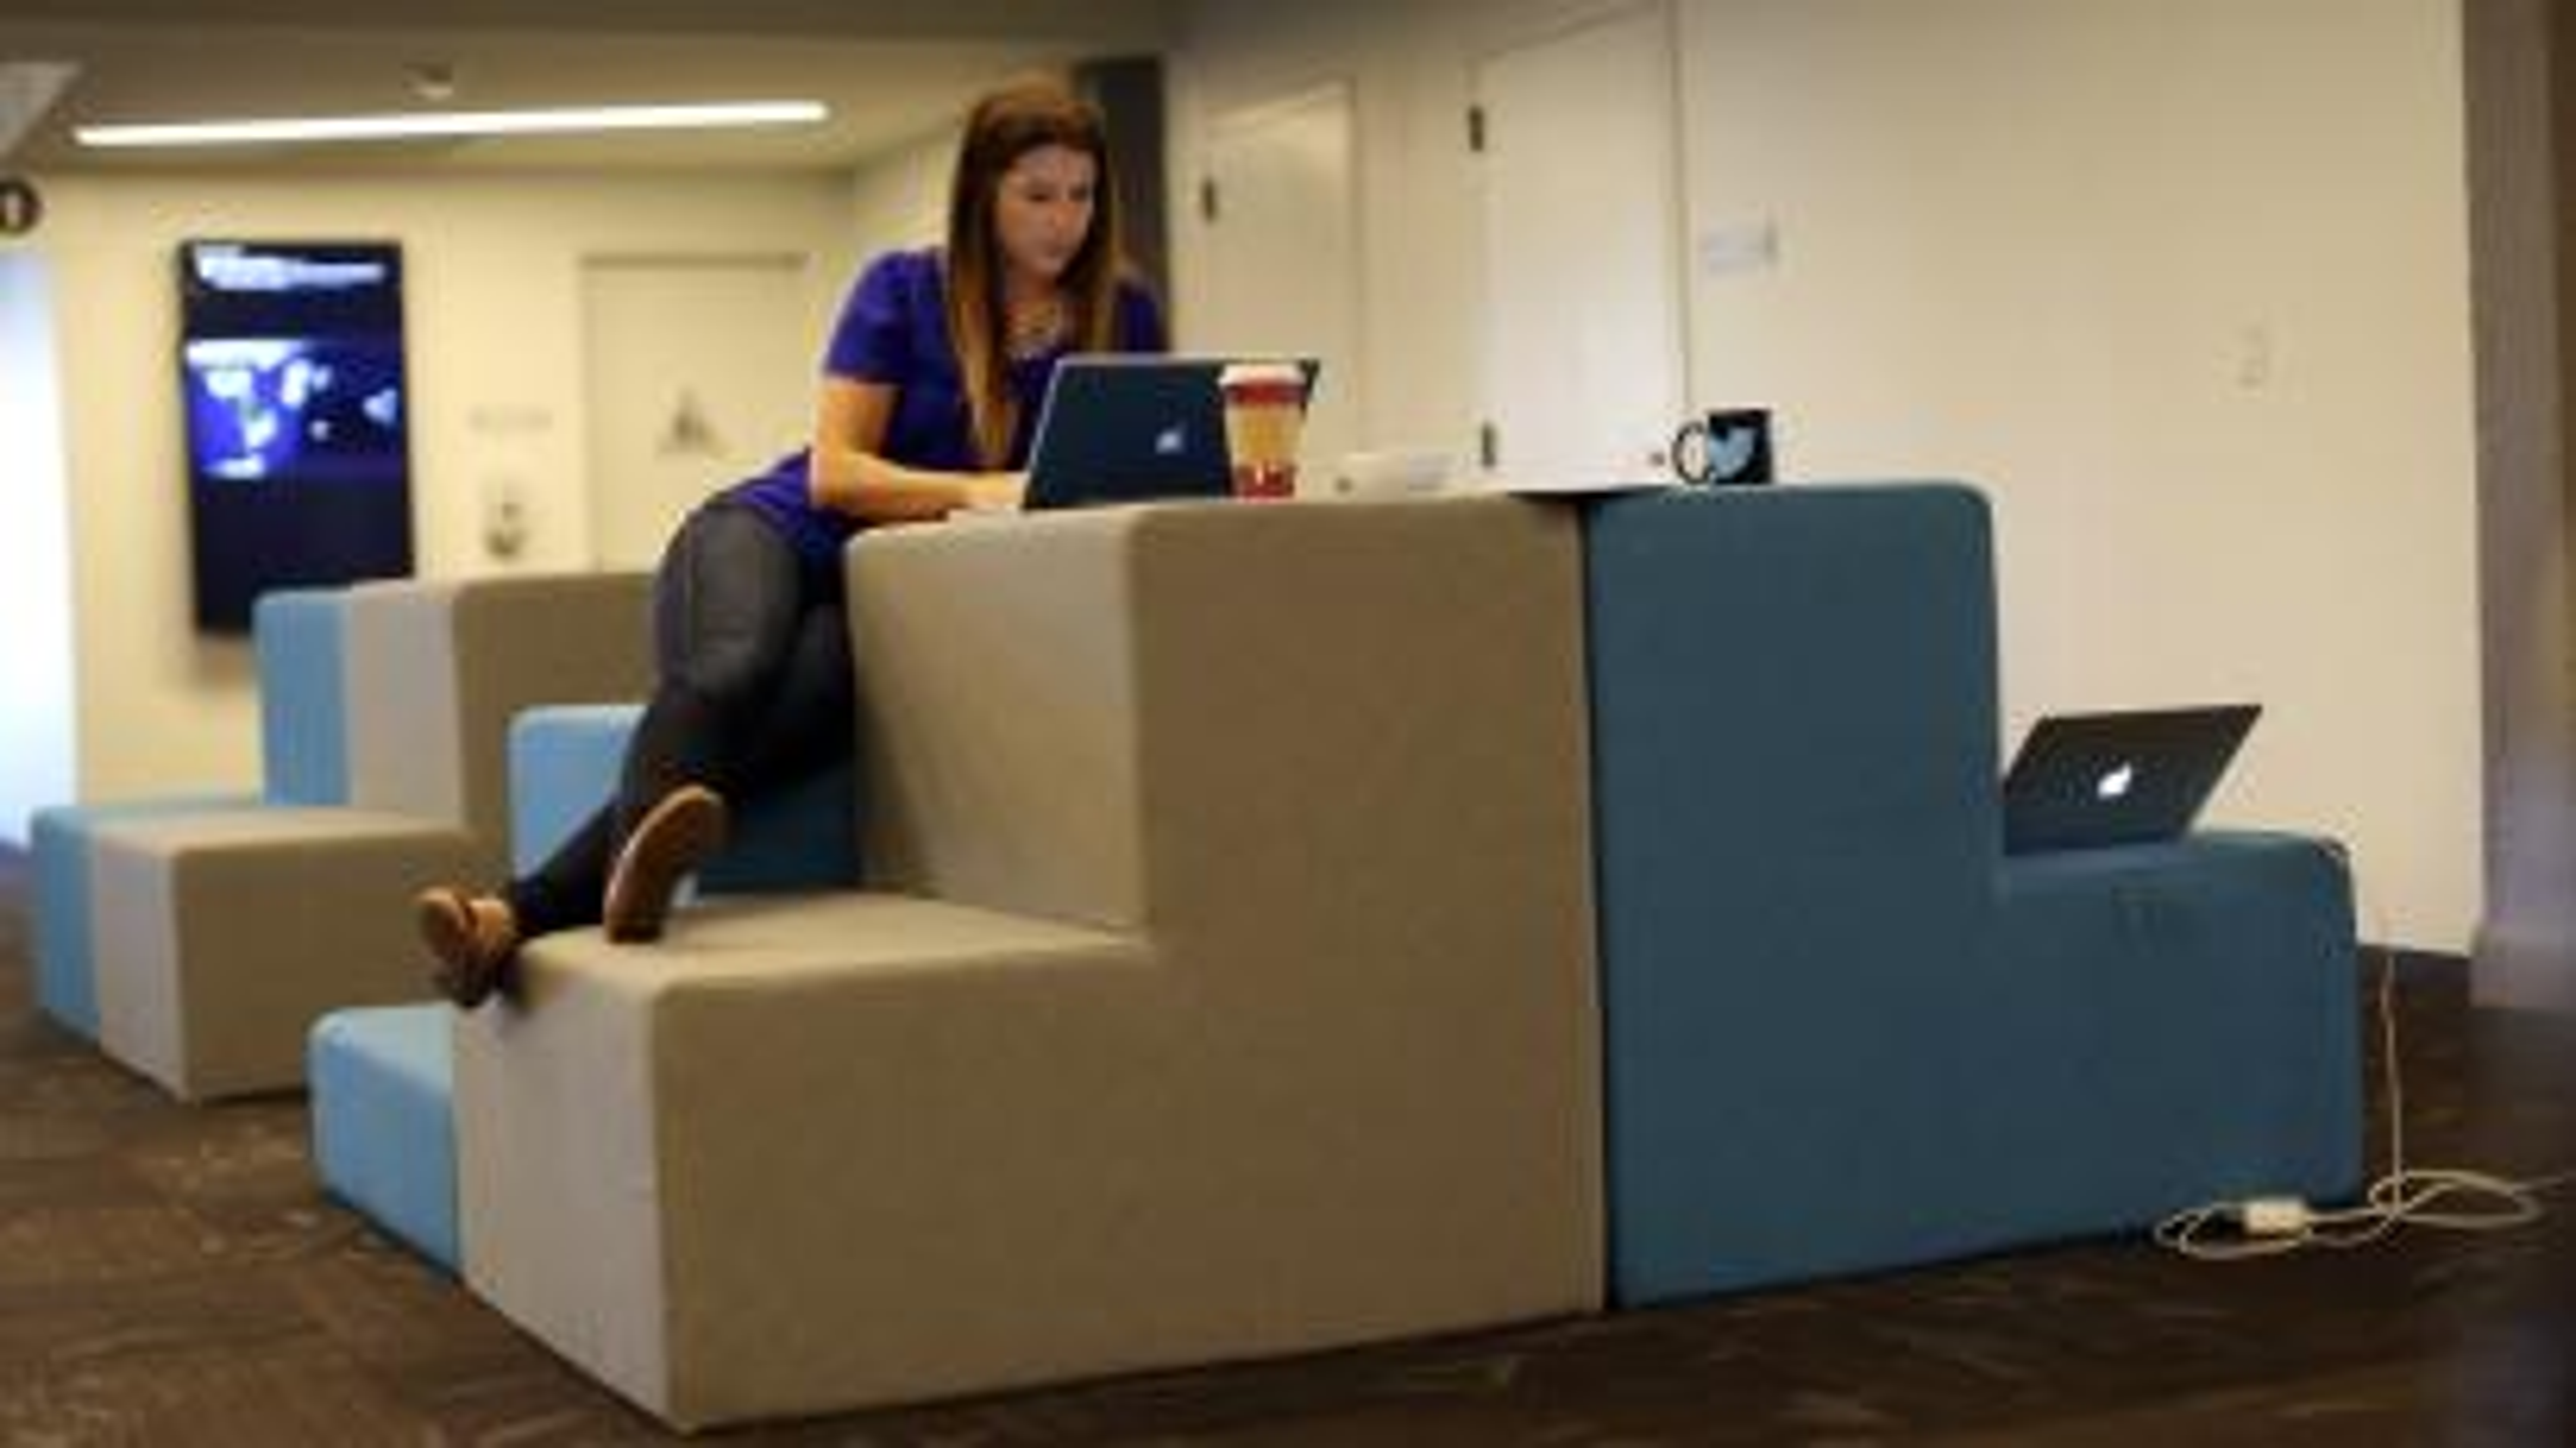 worker sitting alone